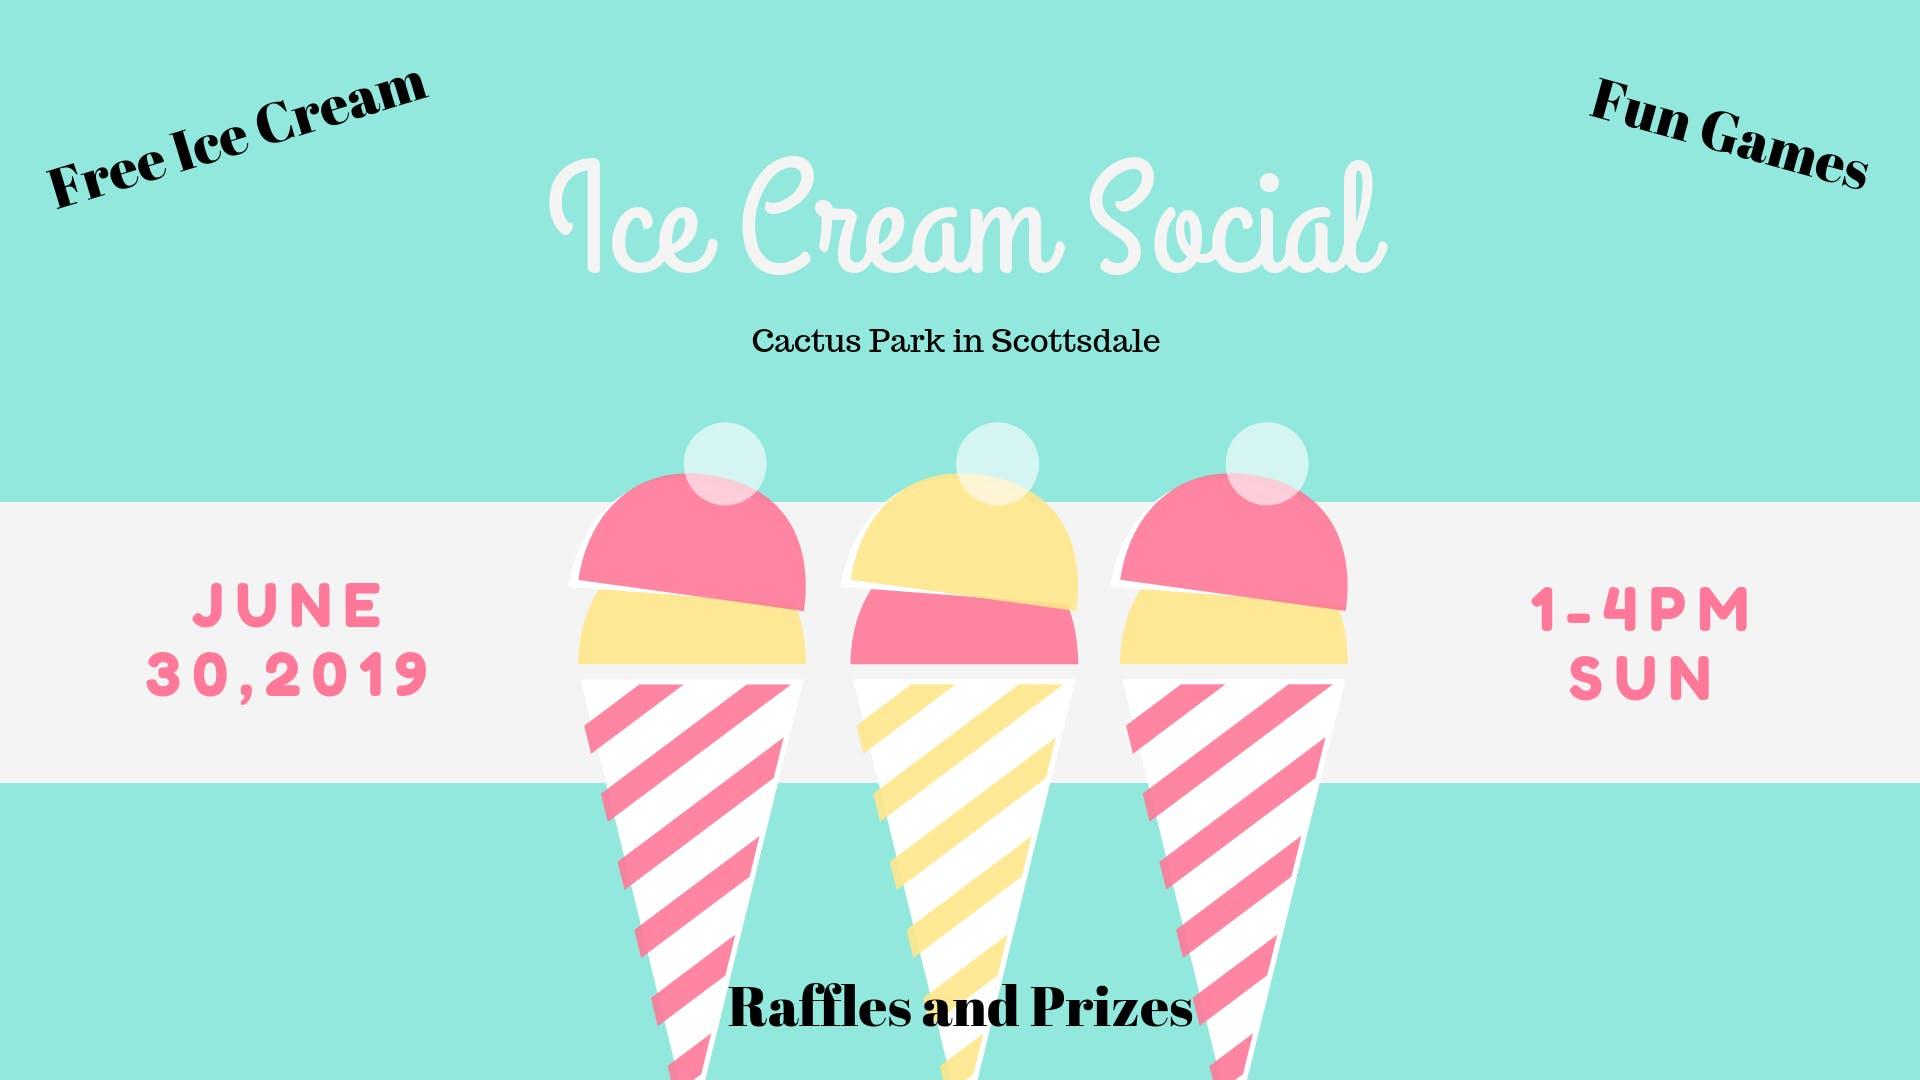 Ice Cream Social Community Event